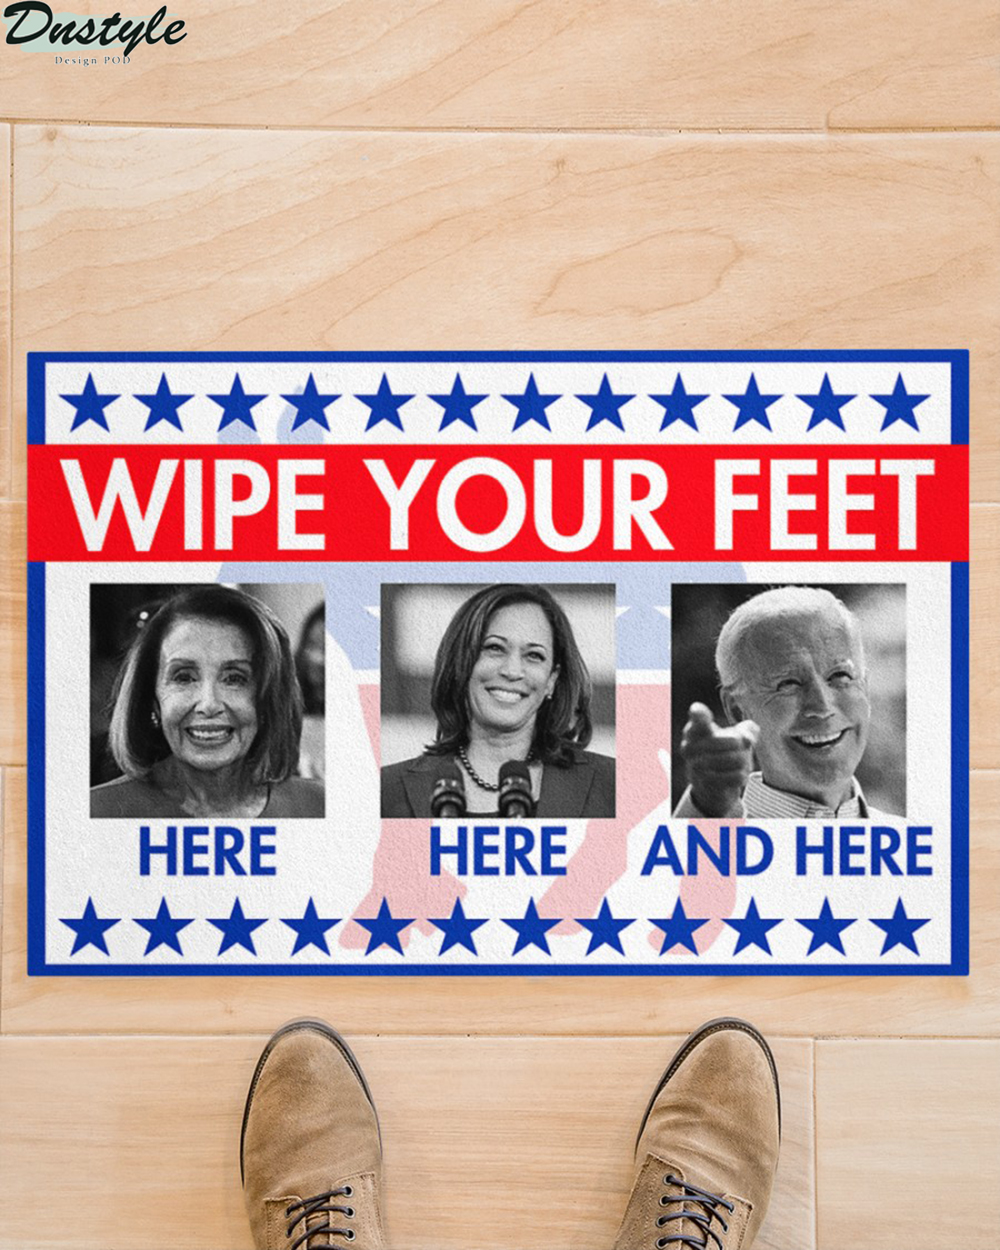 Biden and Kamala Harris wipe your feet here here and here doormat 2